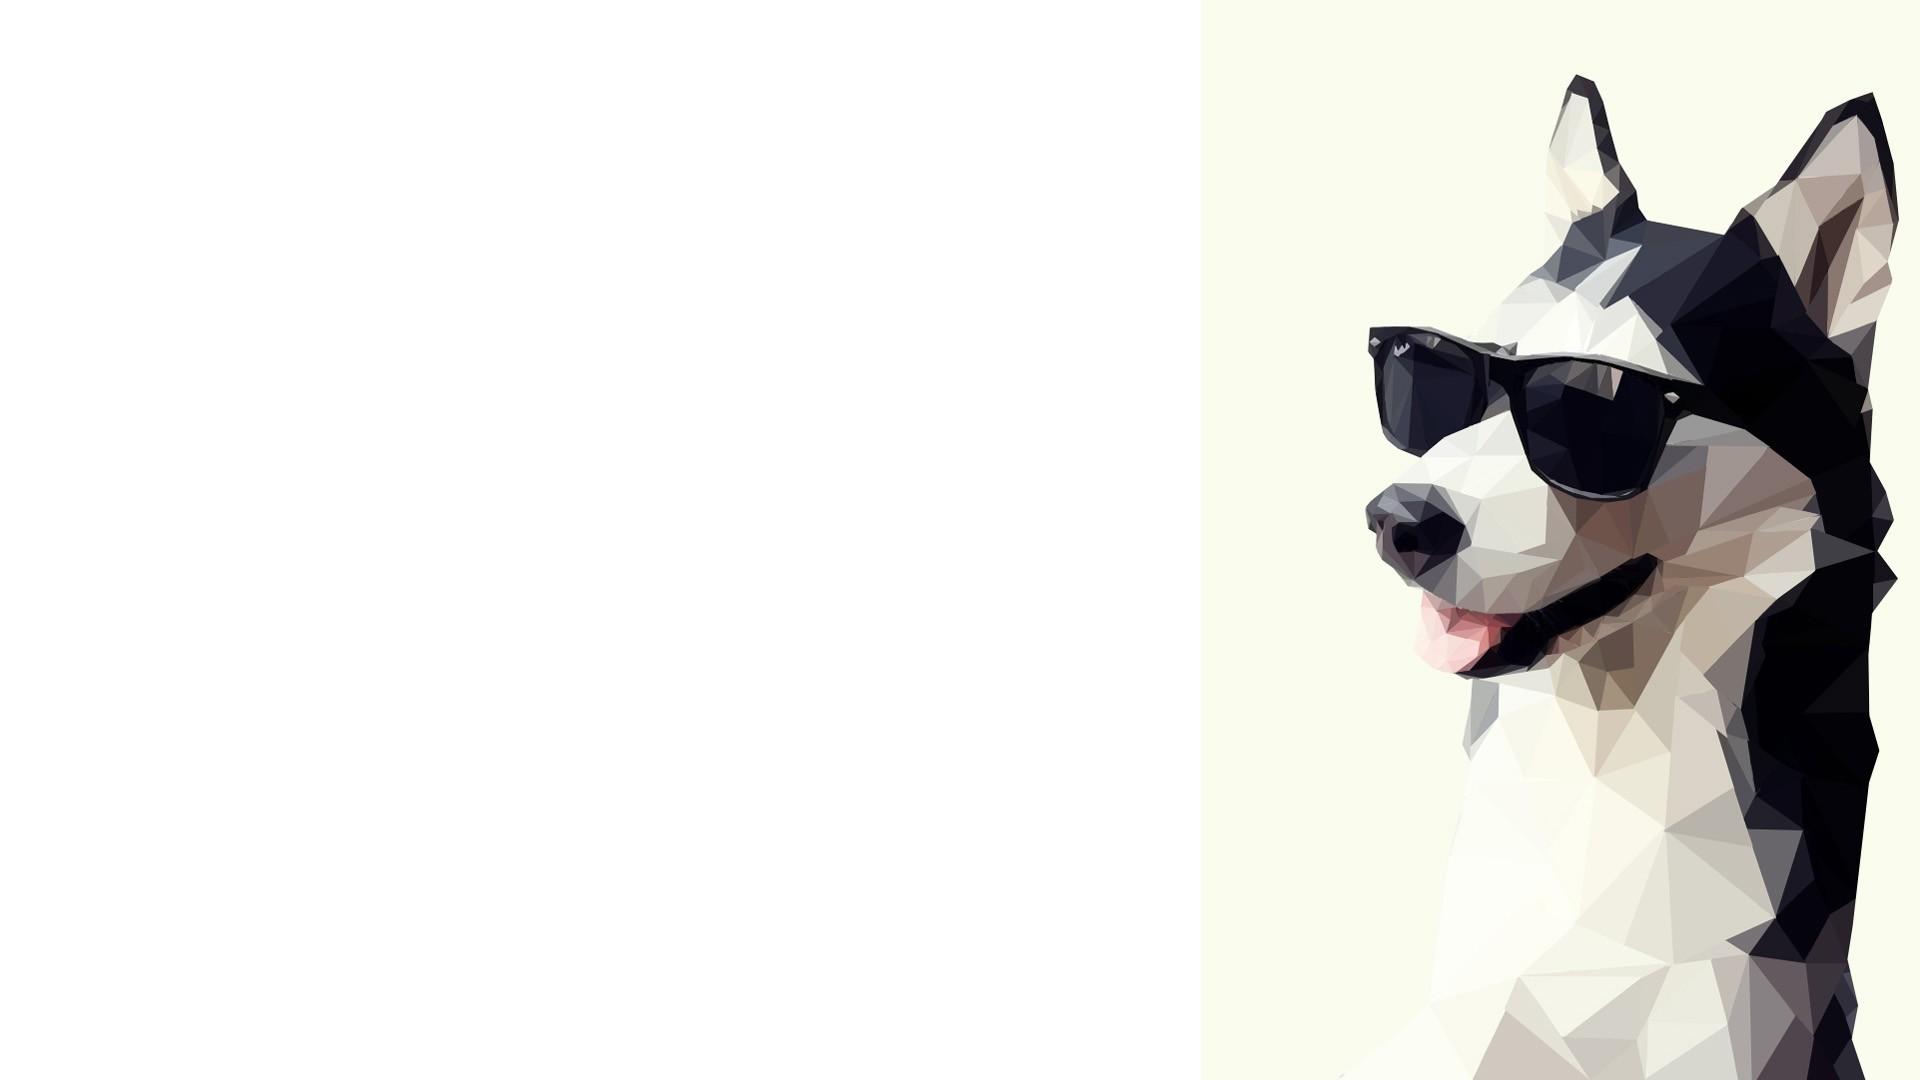 Wallpaper animals simple background sunglasses anime artwork